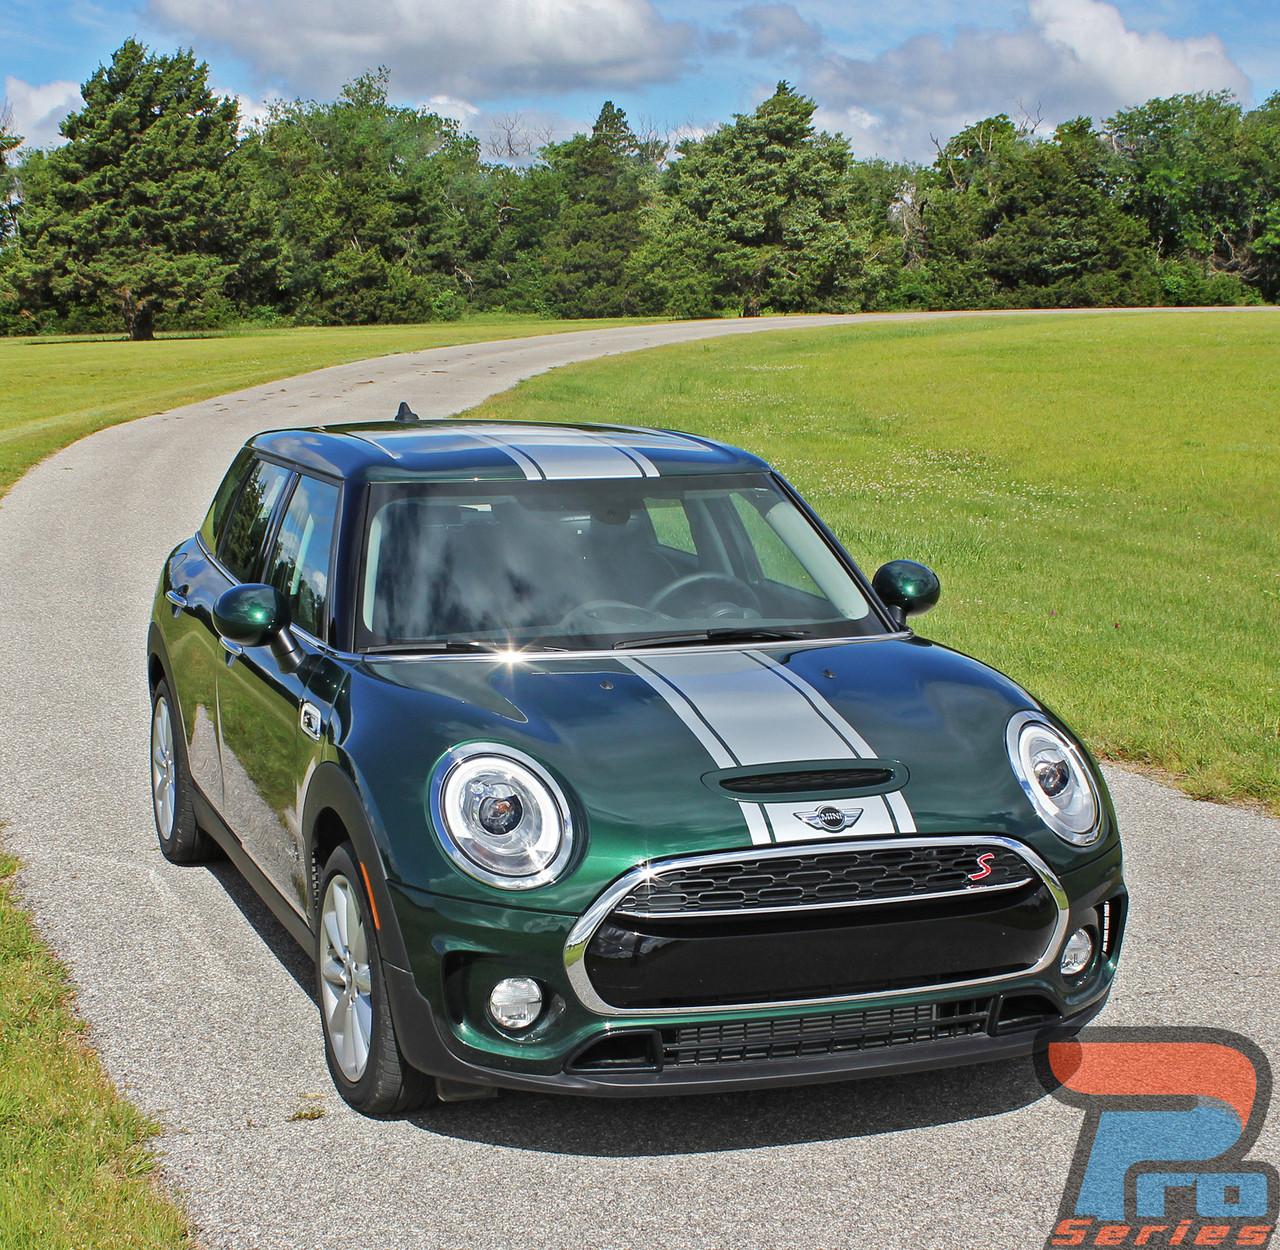 Mini Cooper Hood Stripes Vinyl Graphics Decals S Type Rally 2016 2018